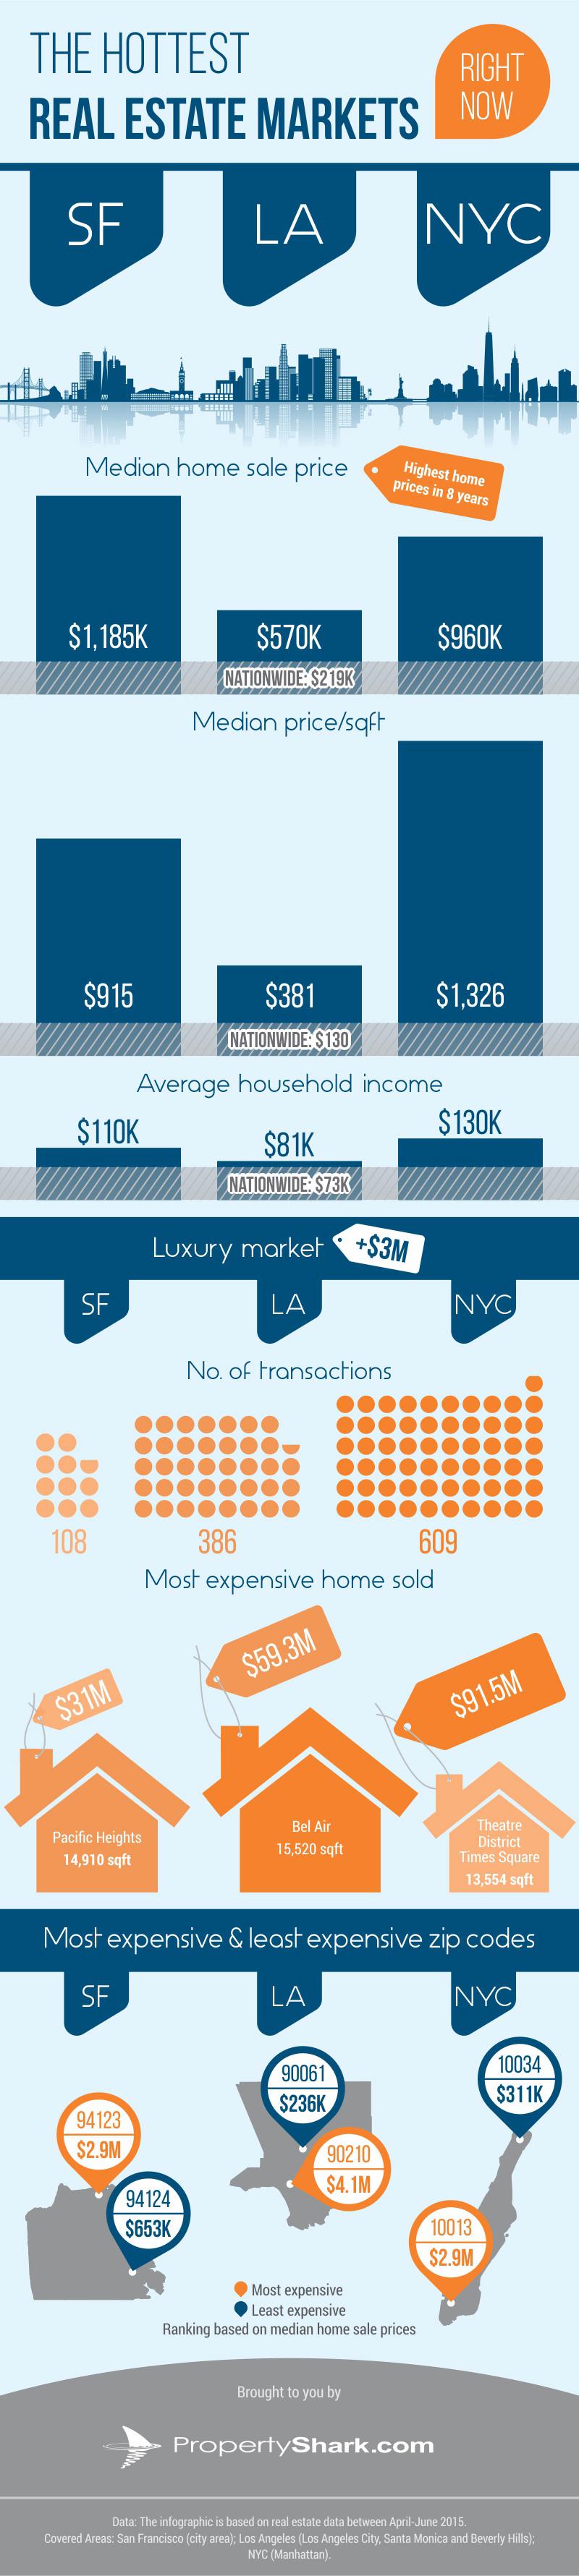 The-Hottest-Real-Estate-Markets_PropertyShark